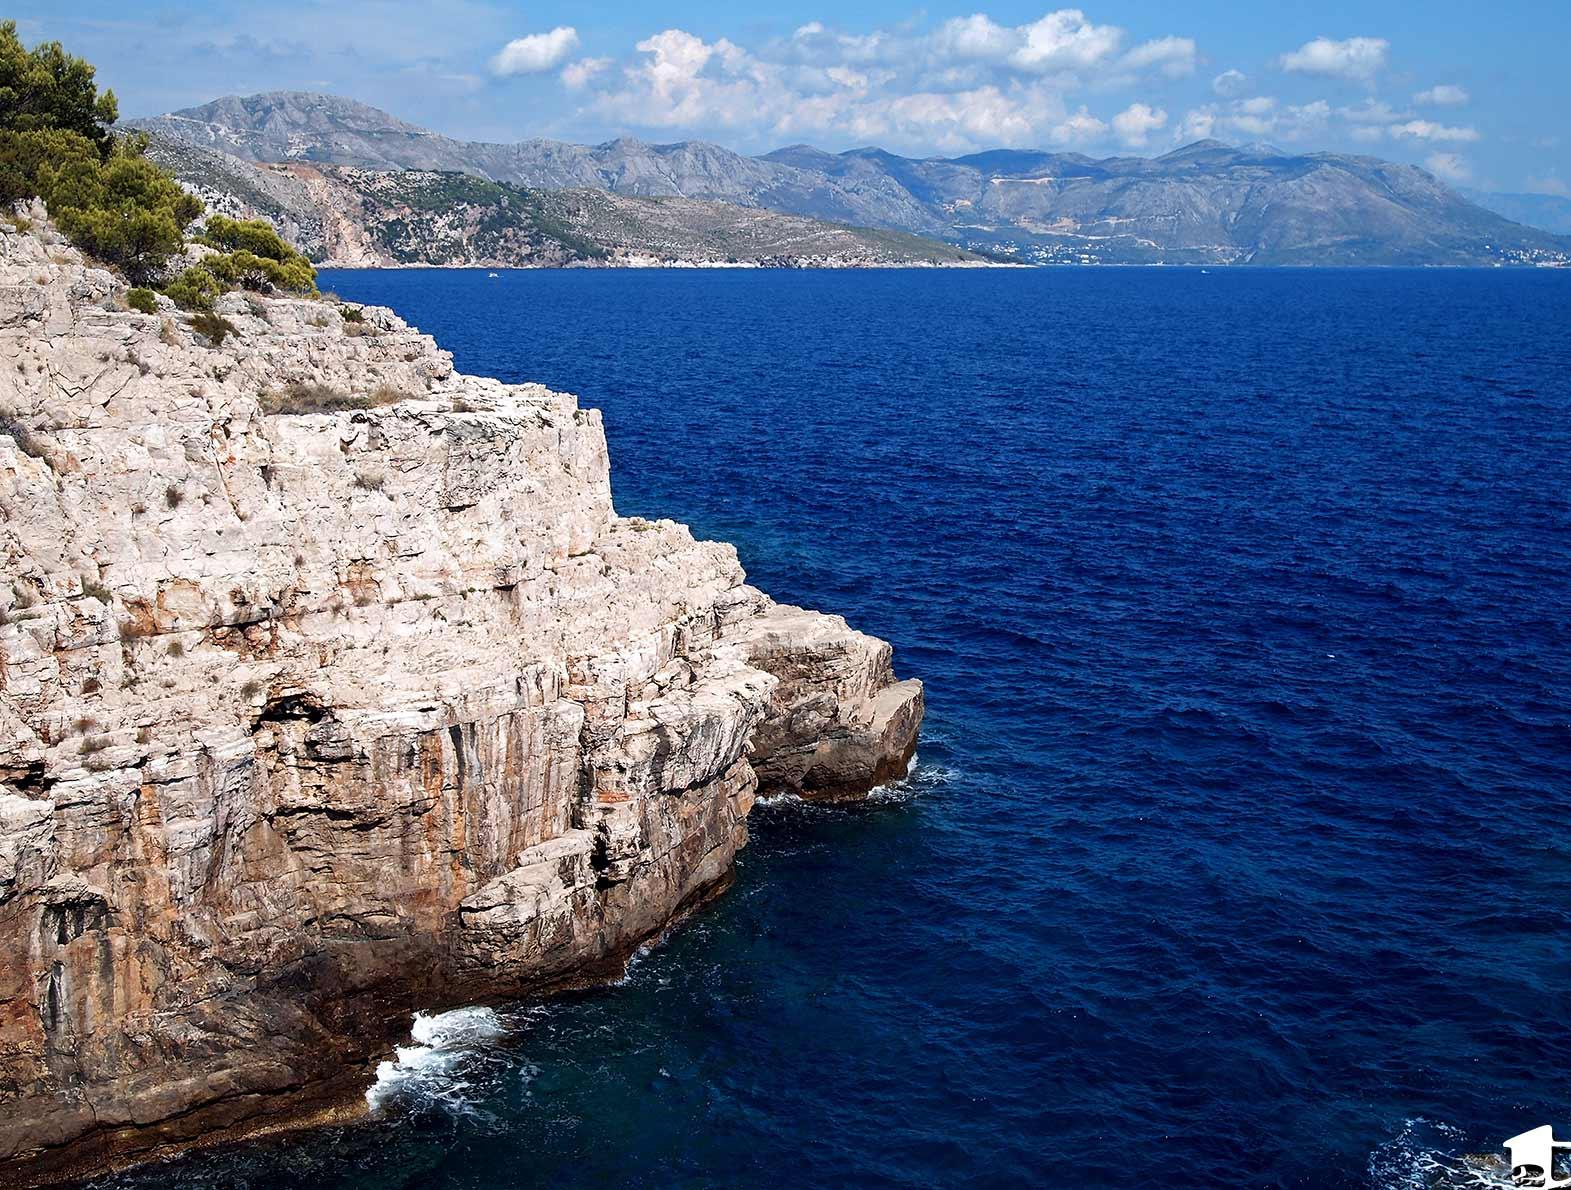 Adriatic Sea off Lokrum Island, Croatia